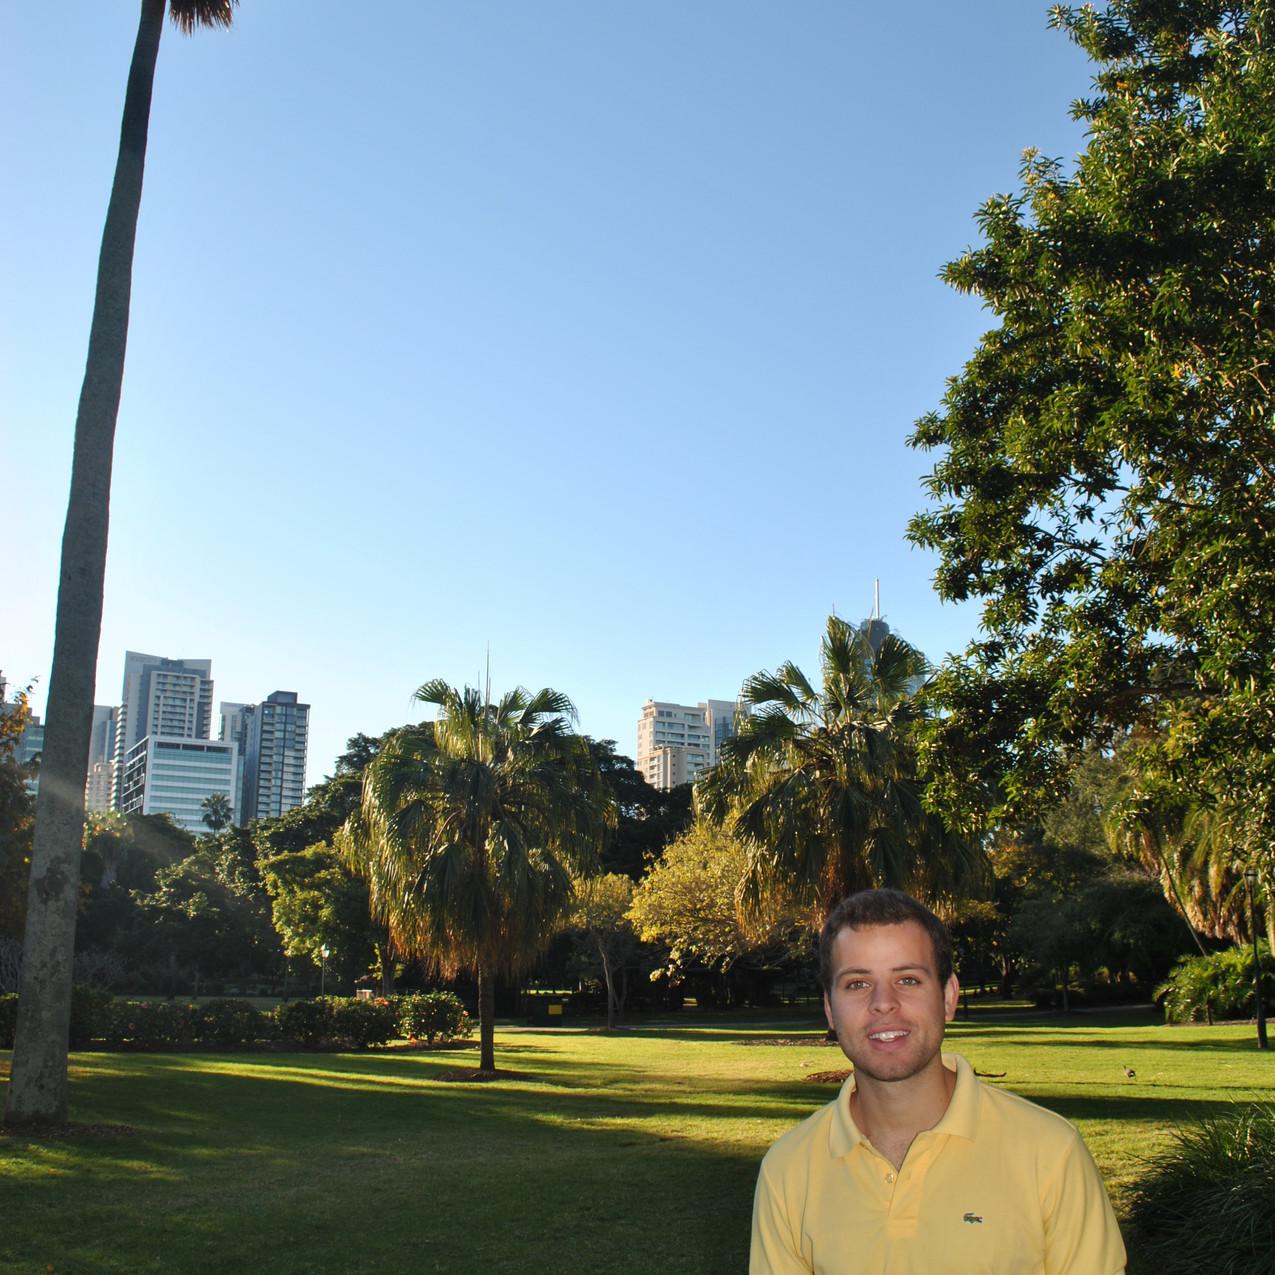 Brisbane Botanical Gardens013